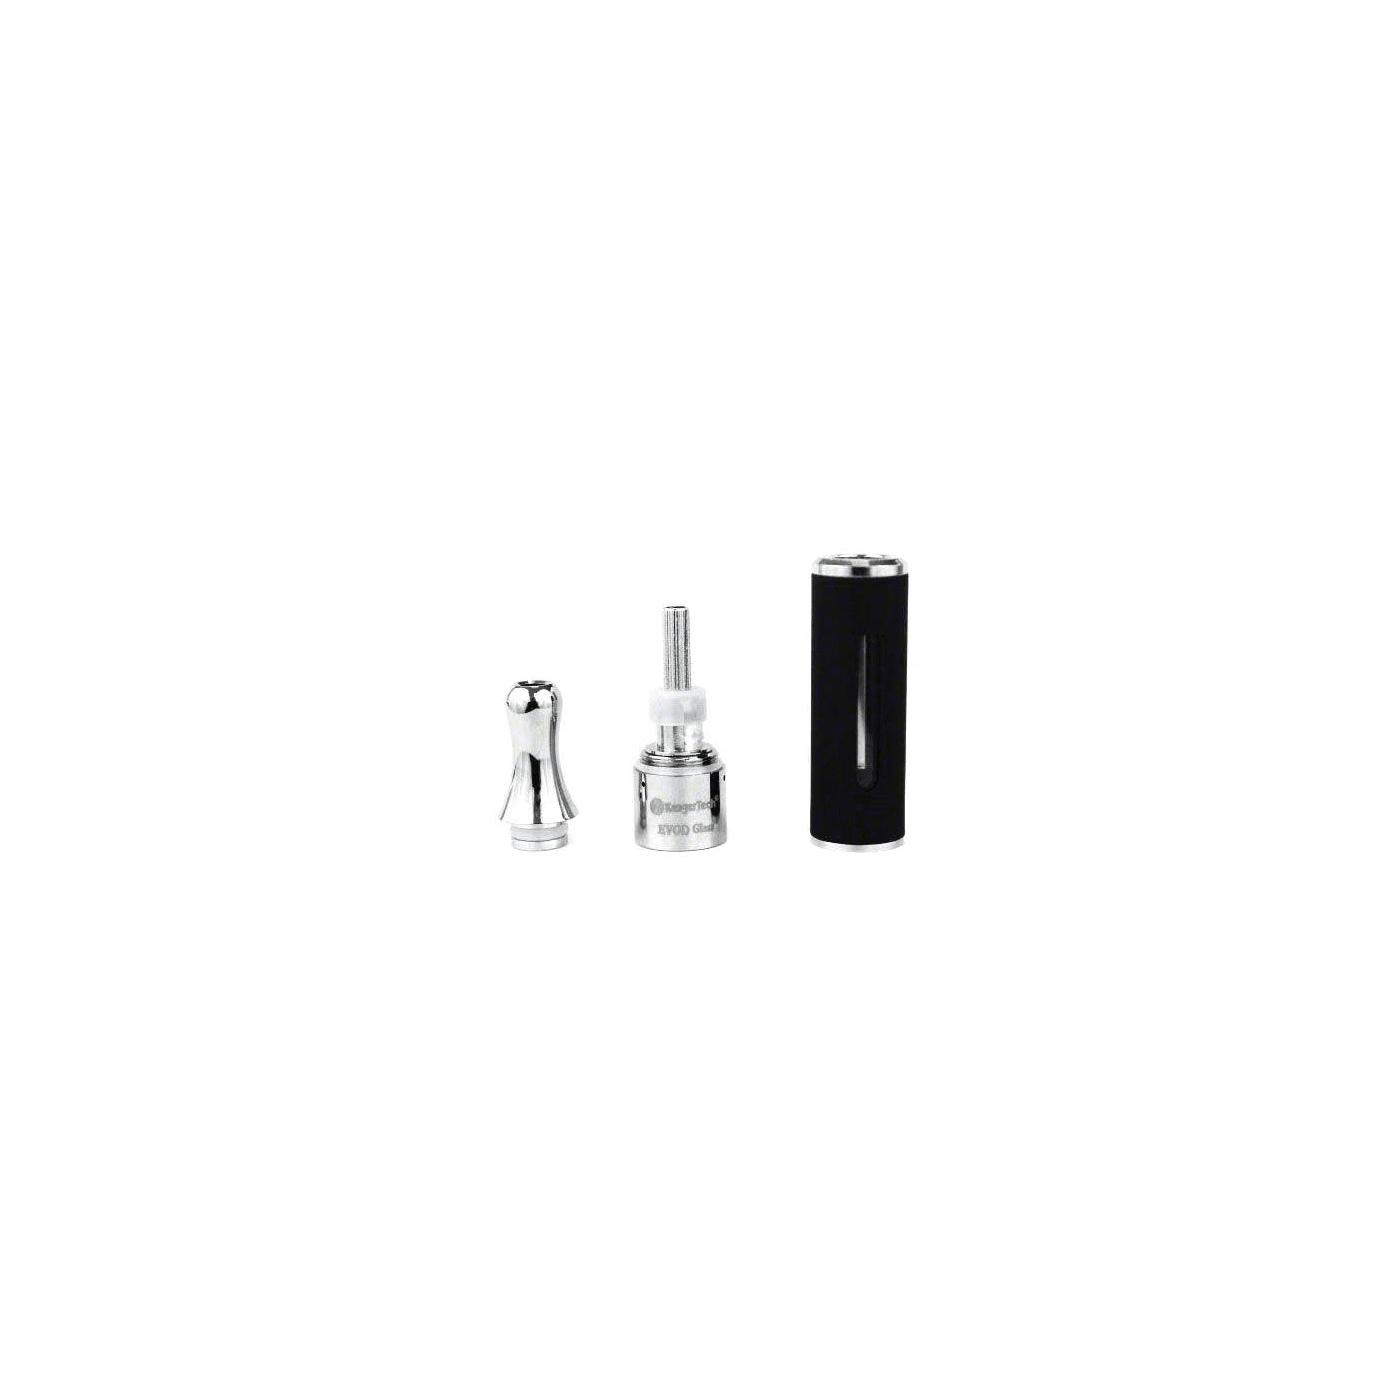 Kanger Evod Glass Clearomizer 1.5 ohm Size